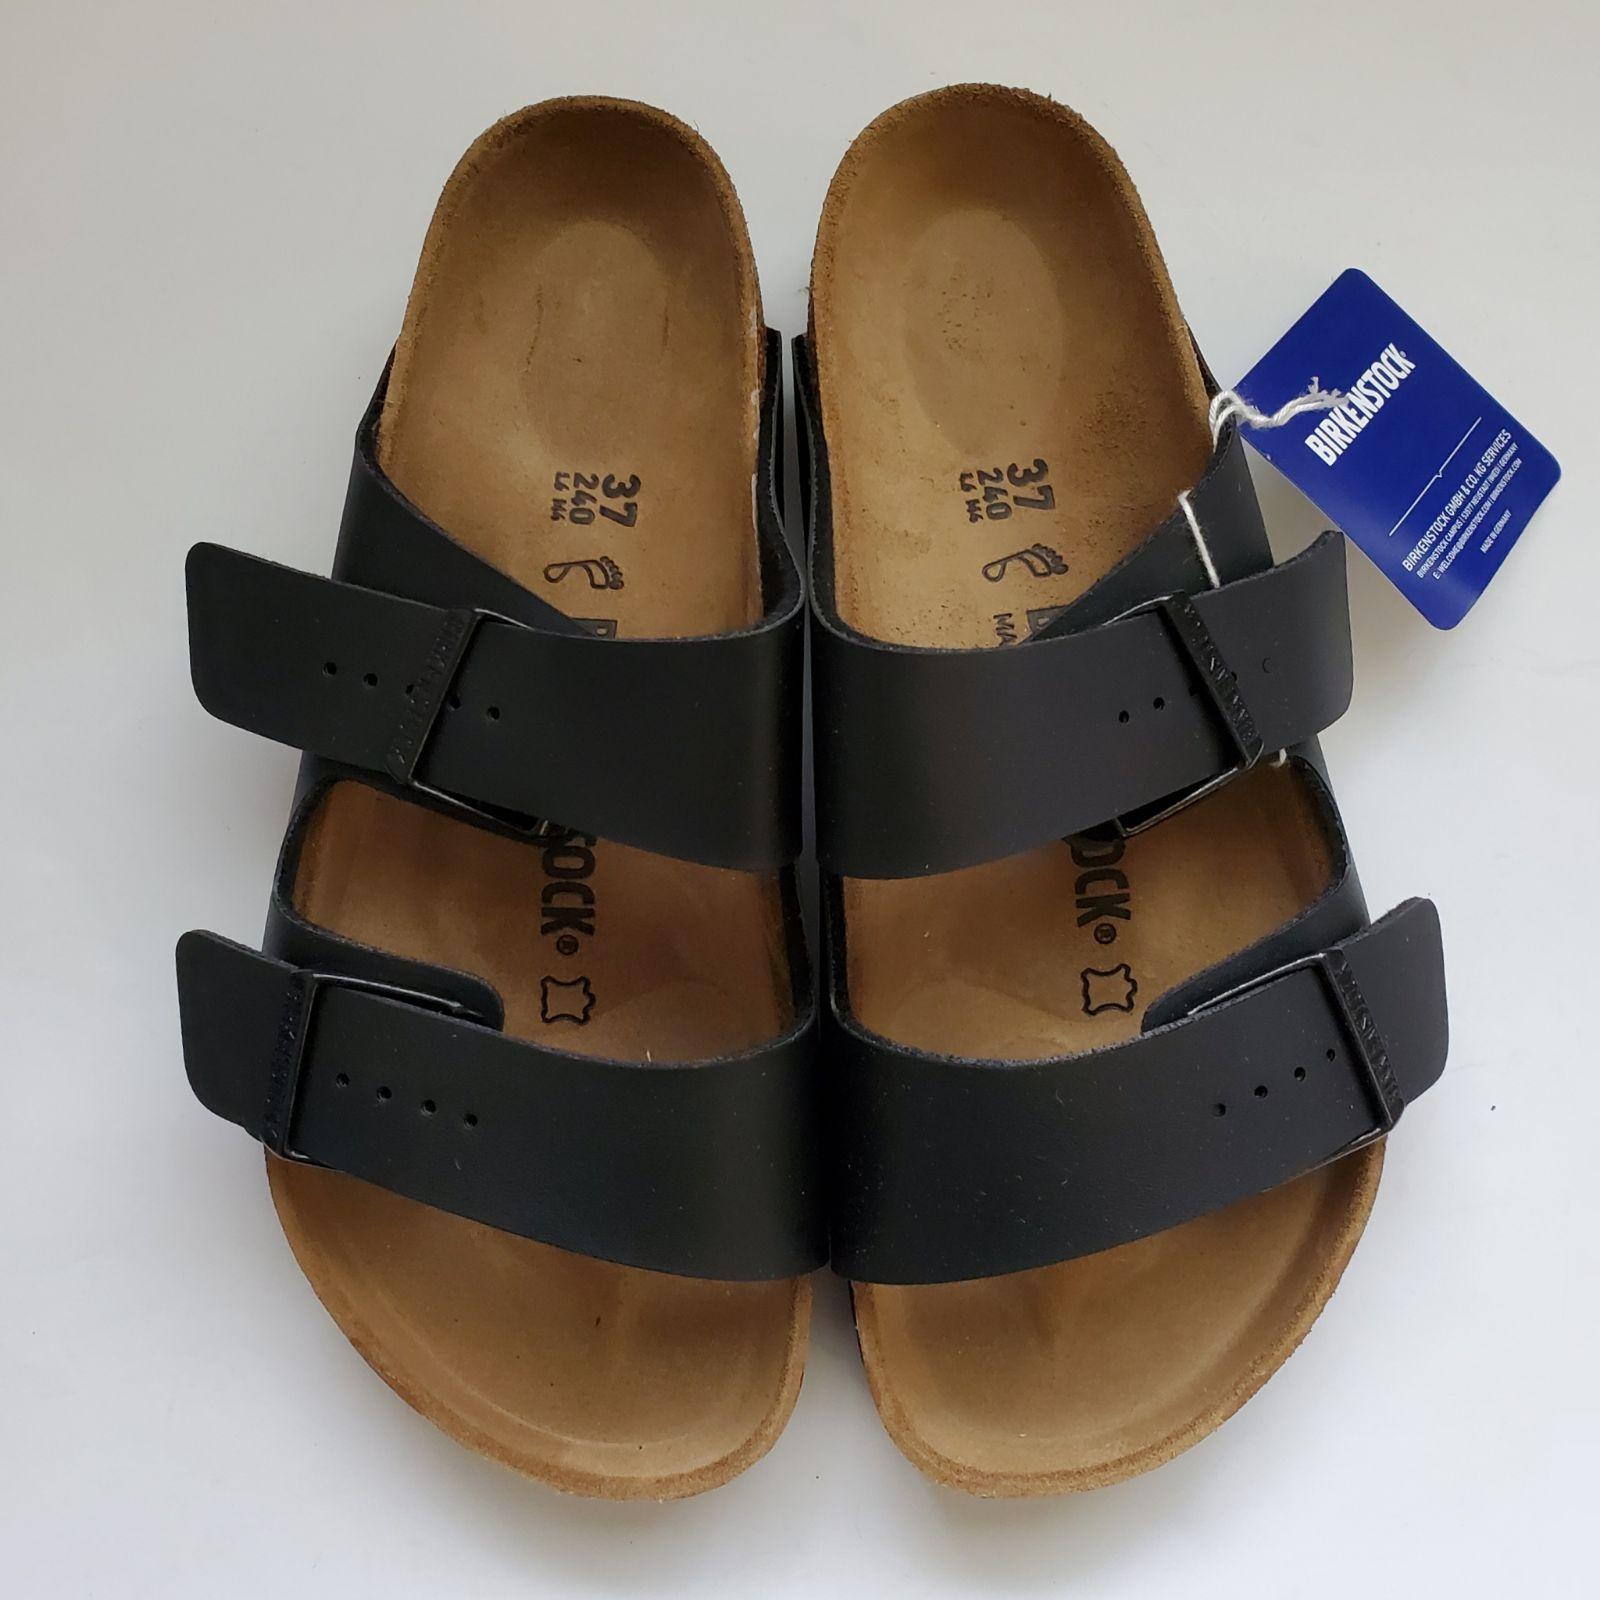 New Birkenstock Arizona Black Sandals Size 37 Medium Birkenstock Sandals Black Sandals Birkenstock